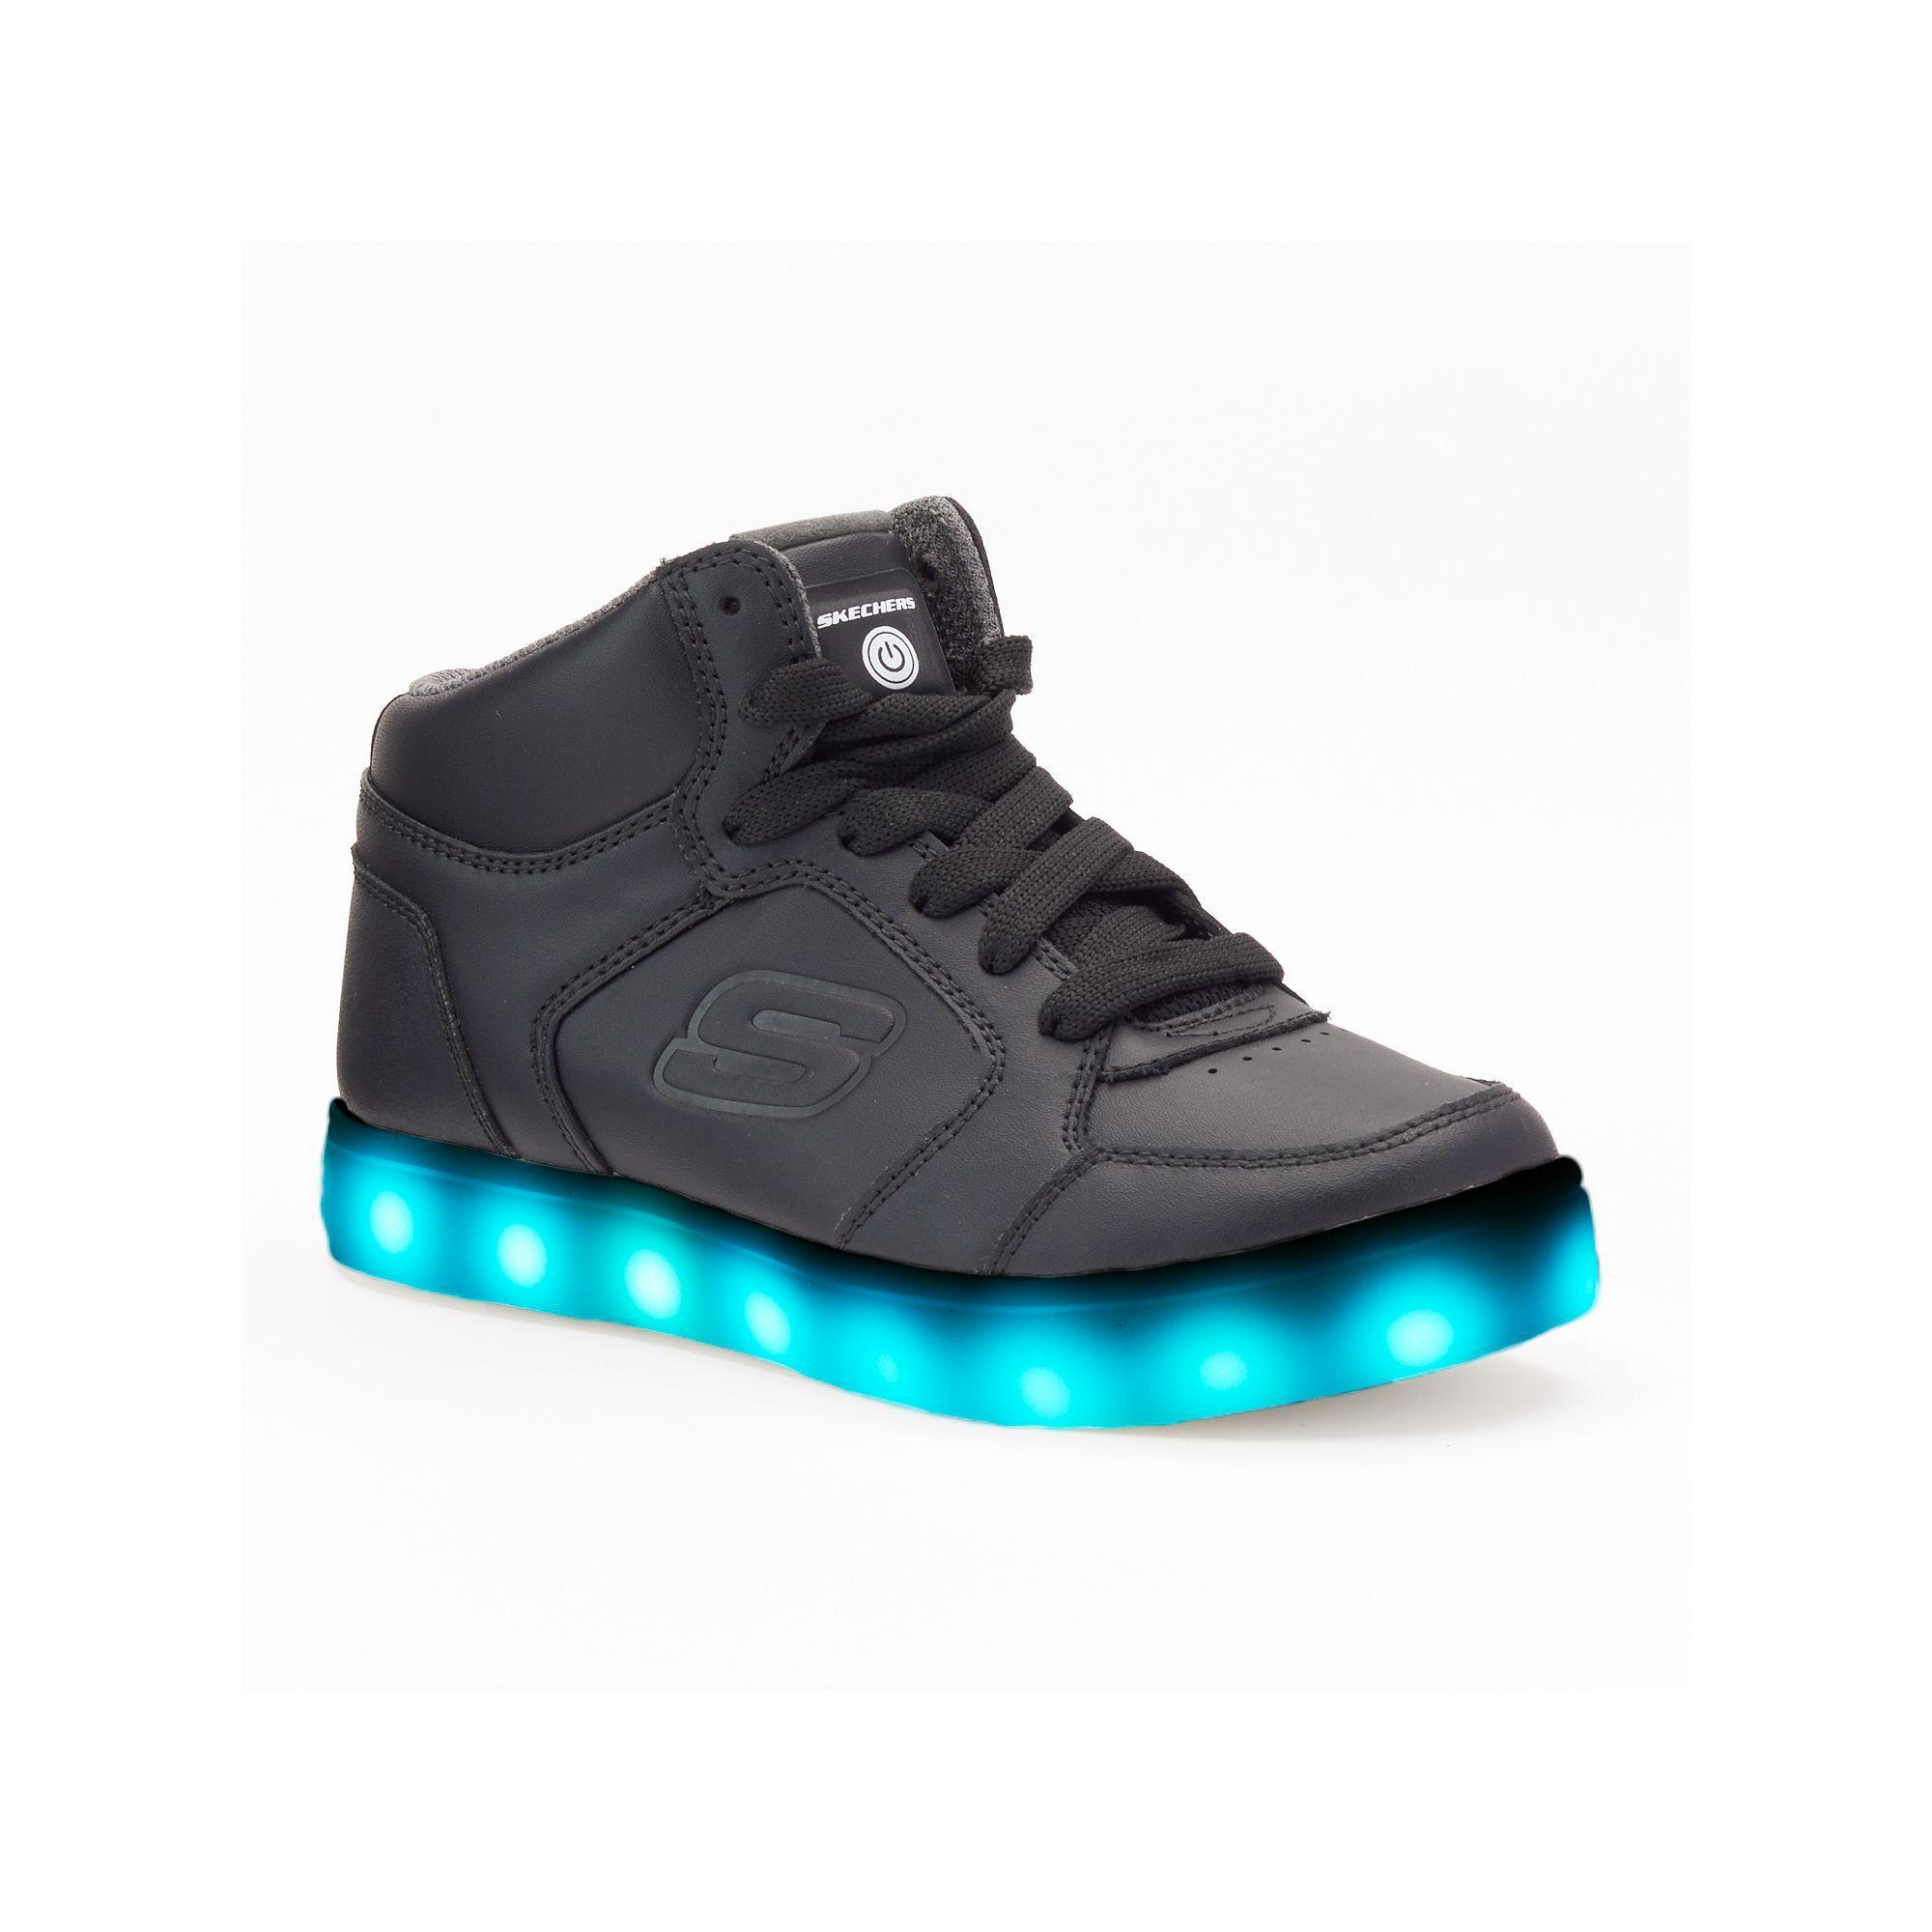 5941d7bdff01 Skechers Energy Lights Kid s Shoes